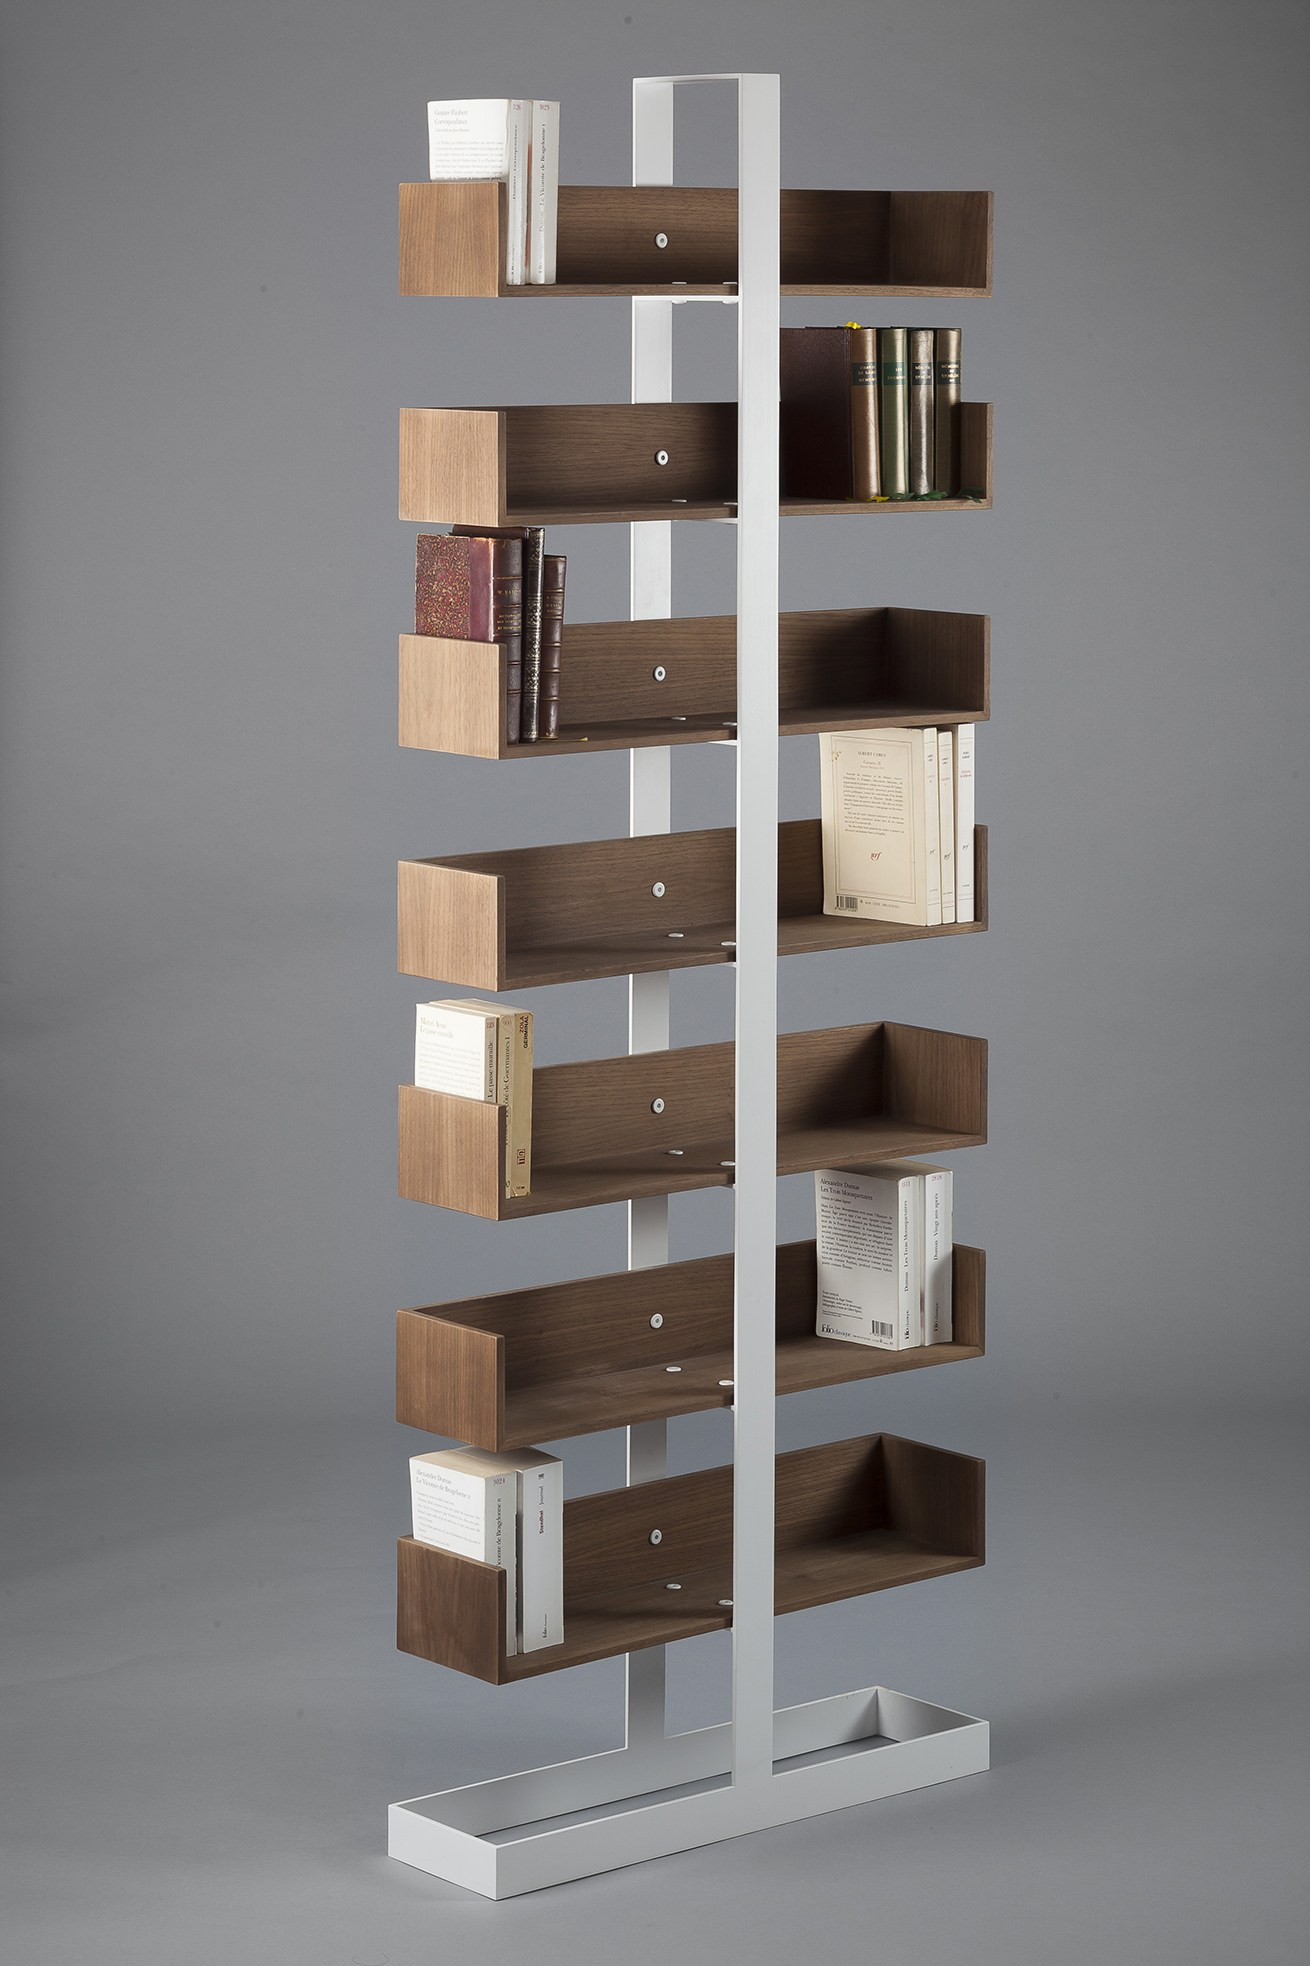 s verin 1 by alex de rouvray design design alex de rouvray. Black Bedroom Furniture Sets. Home Design Ideas